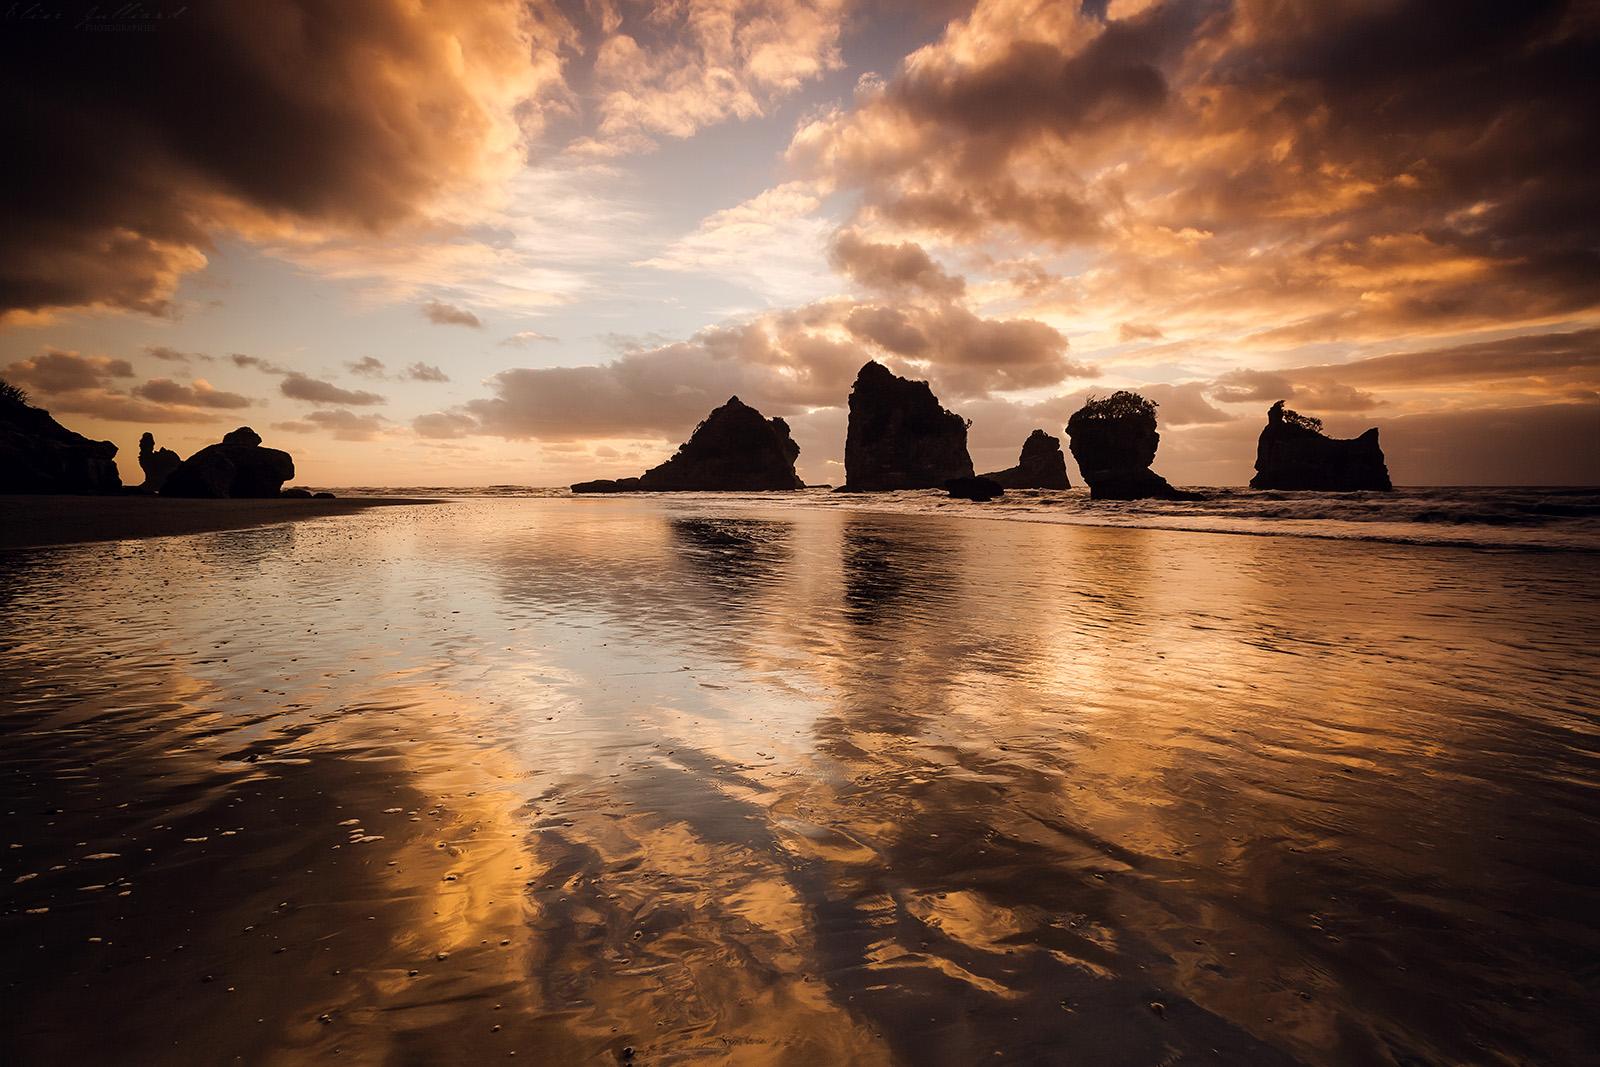 nouvelle-zelande-new-zealand-south-island-motukiekie-beach-rocks-west-coast-sunset-elise-julliard-photographe-photographer-french-wildlife-landscape-tasman-sea-barrytown